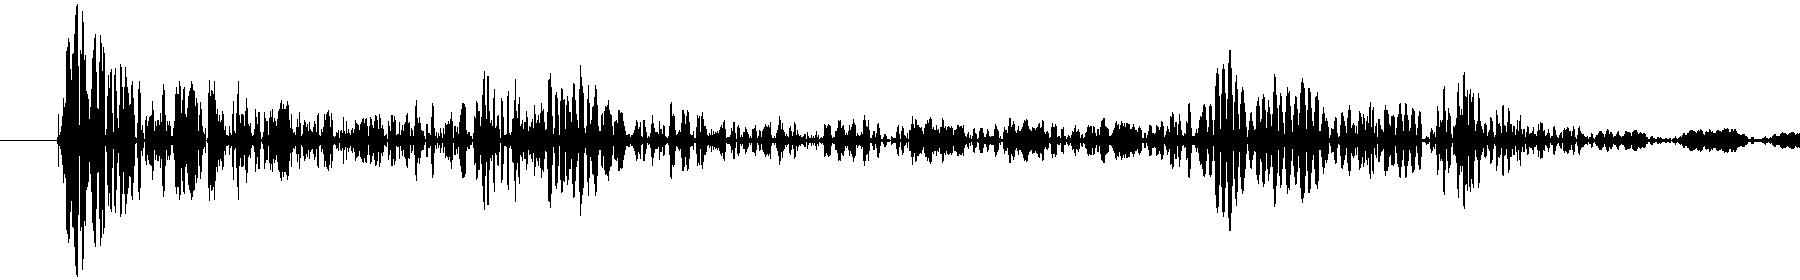 perc 1 51